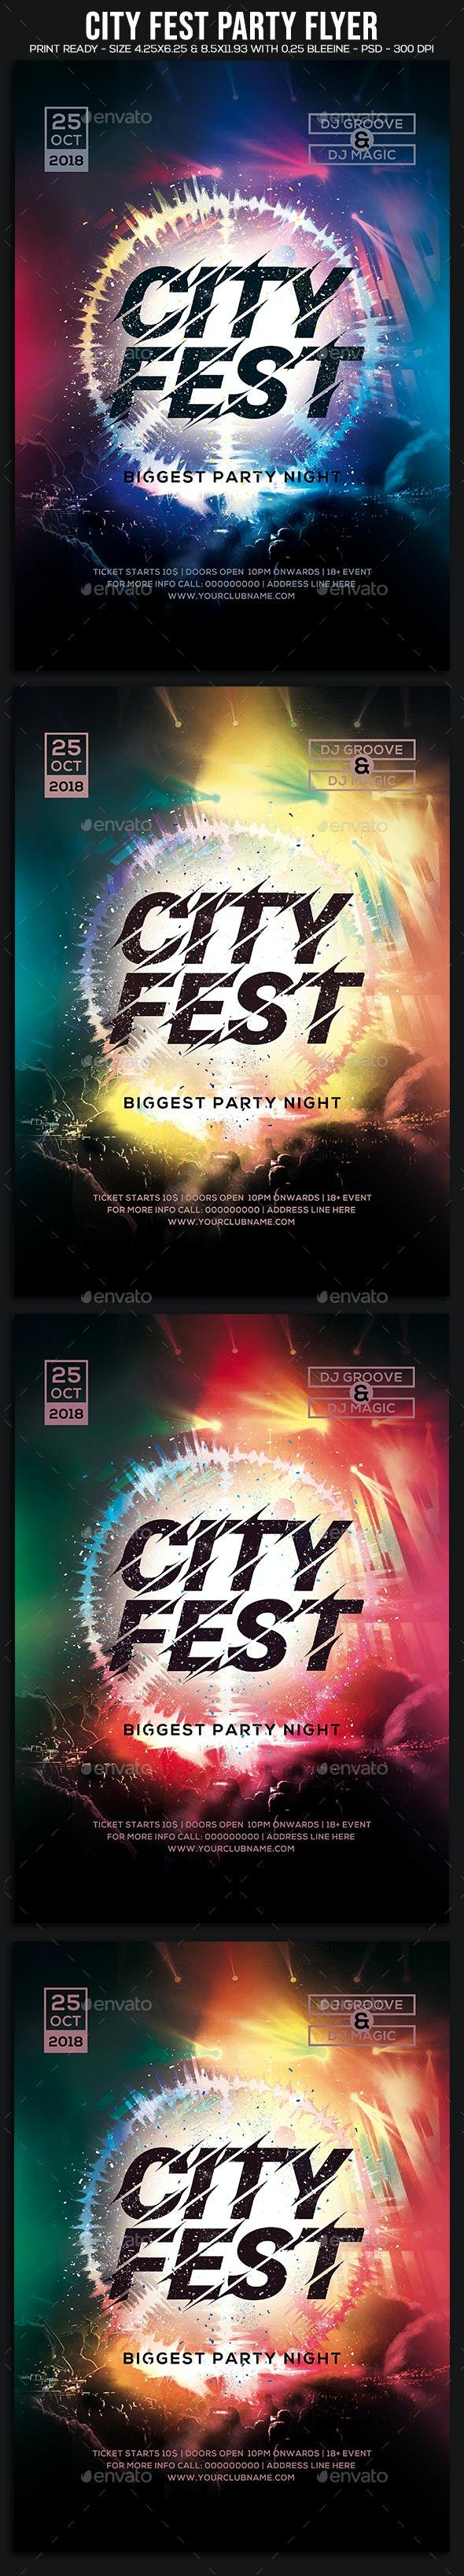 City Fest Party Flyer - Clubs & Parties Events